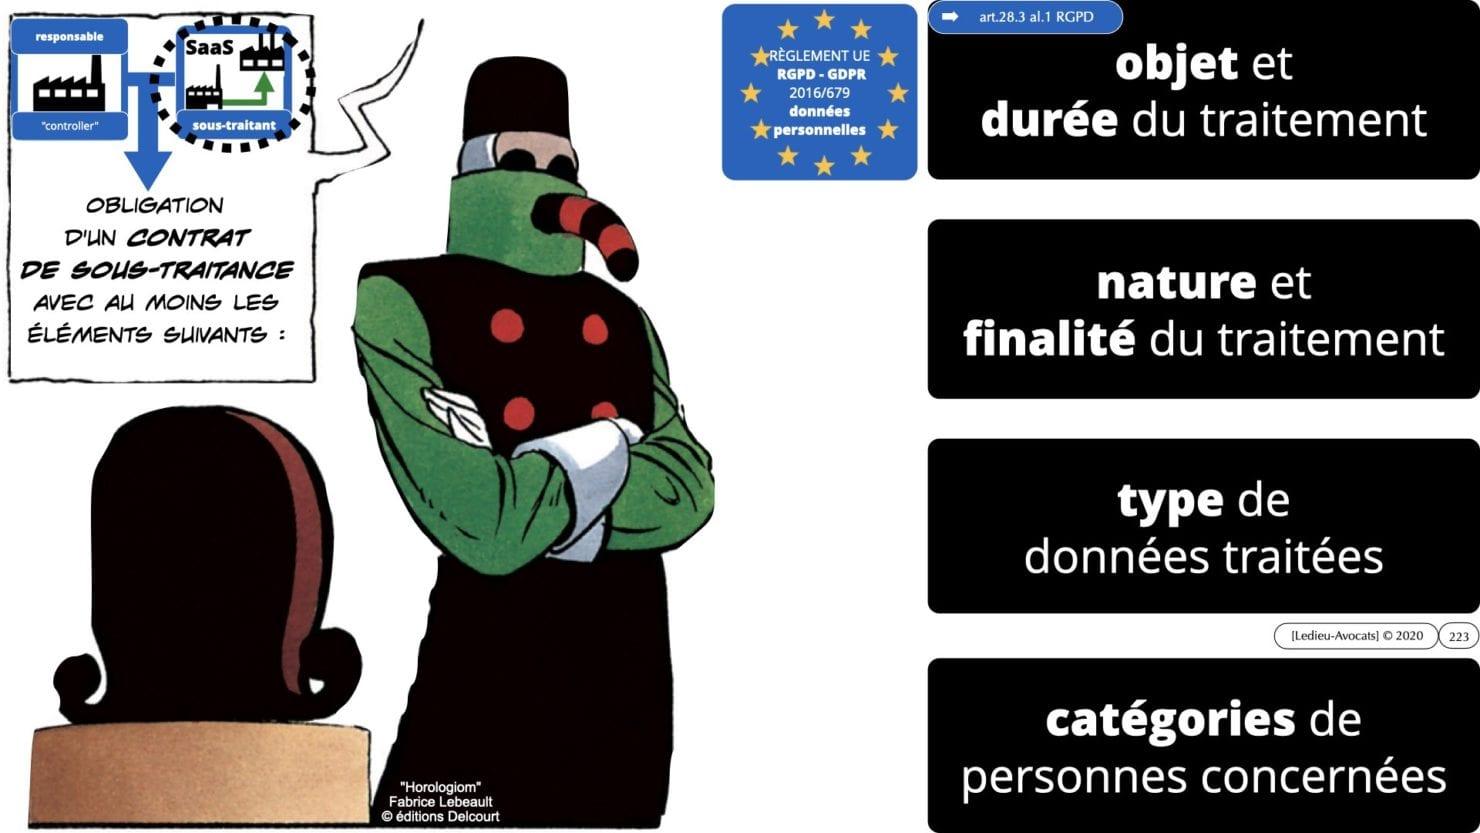 RGPD e-Privacy principes actualité jurisprudence ©Ledieu-Avocats 25-06-2021.223